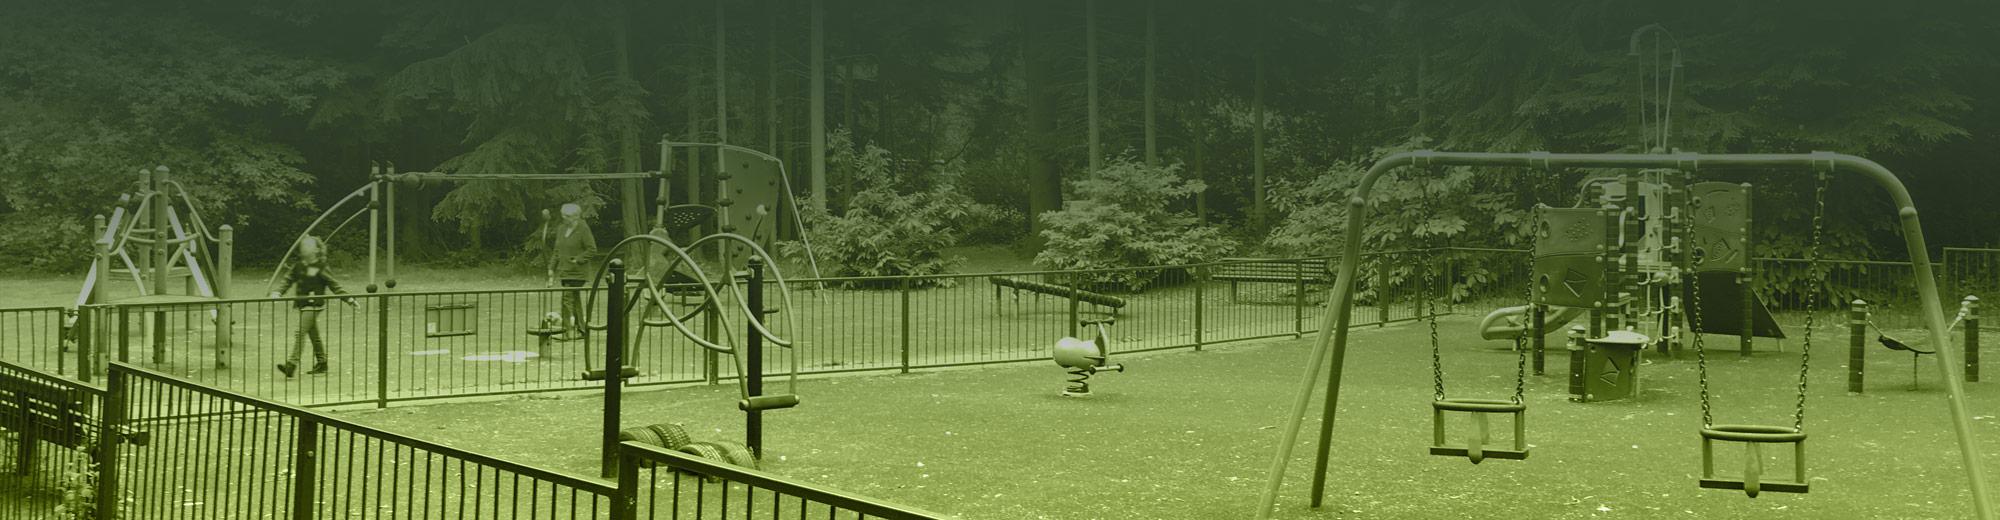 Winkfield Playground